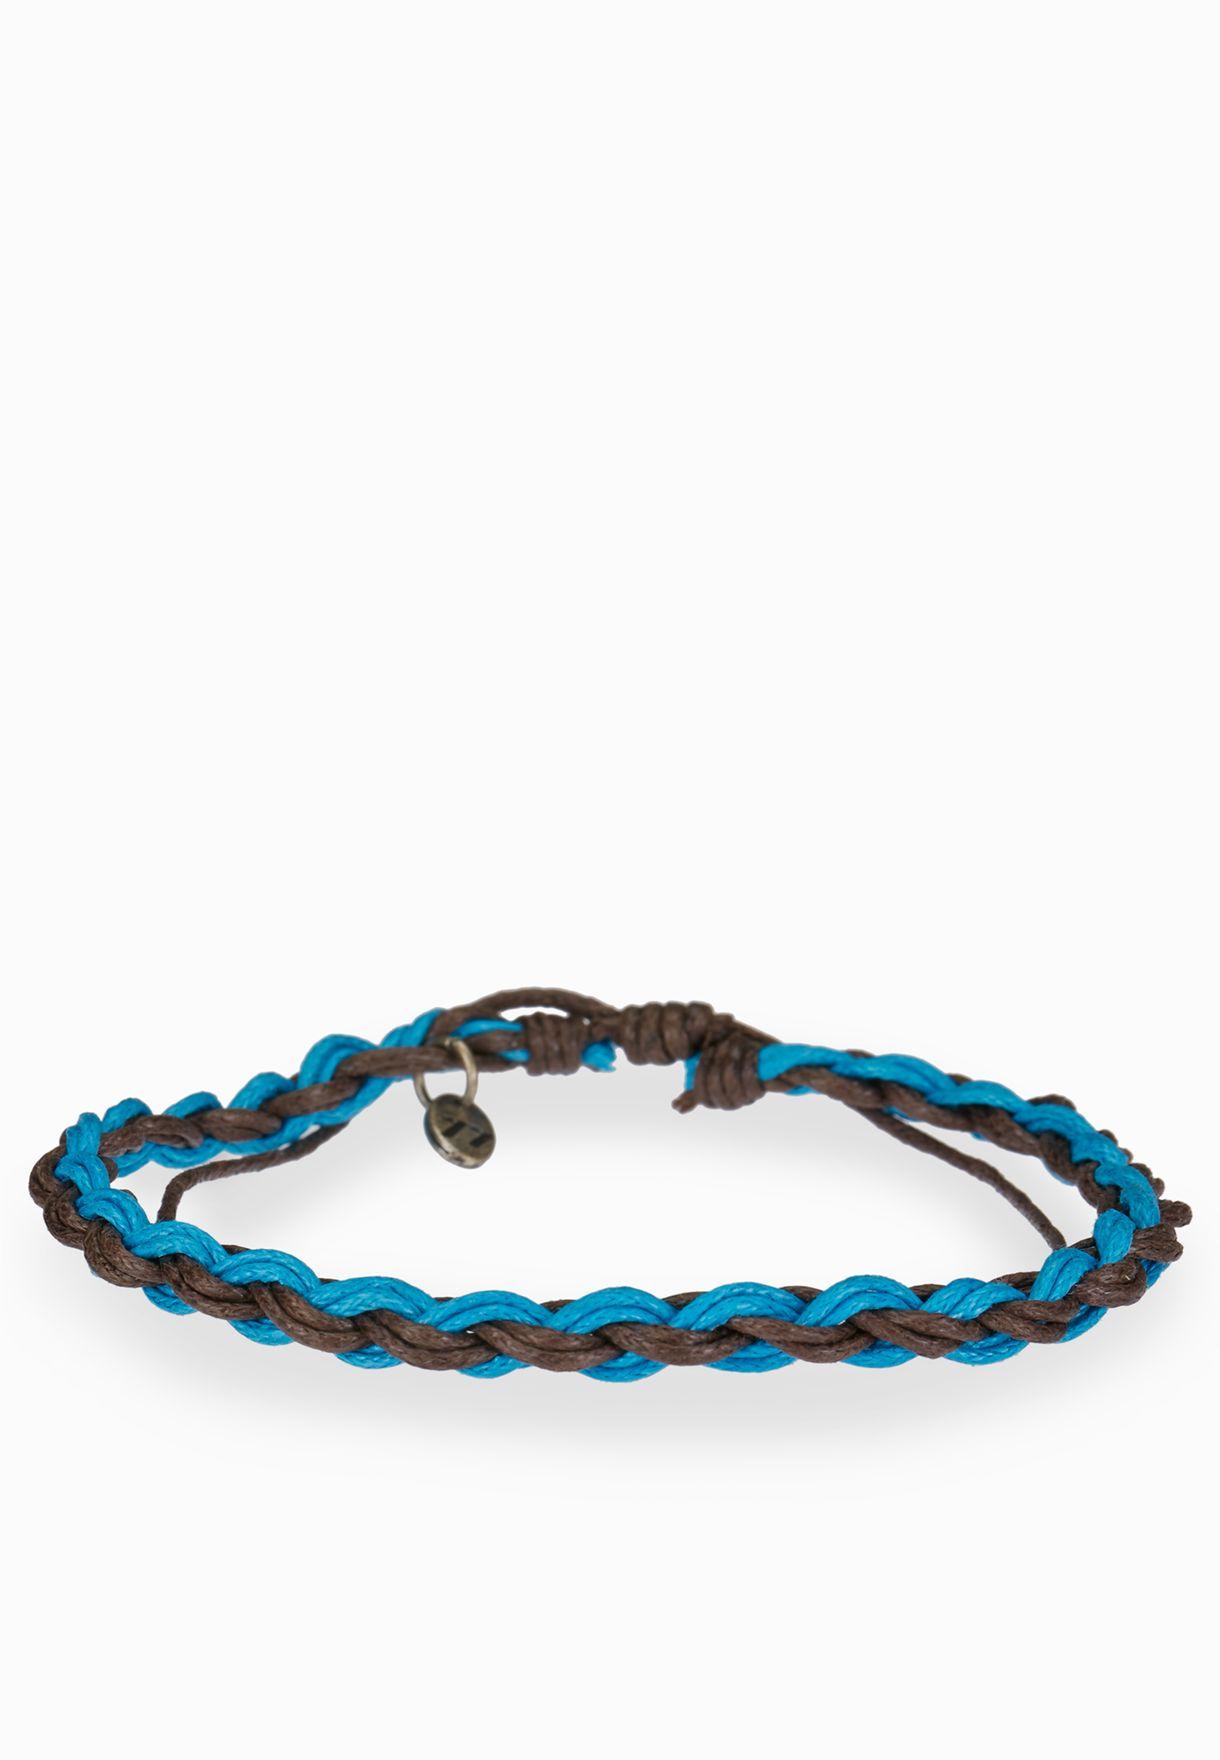 5 Pack Davce Dudley Bracelets